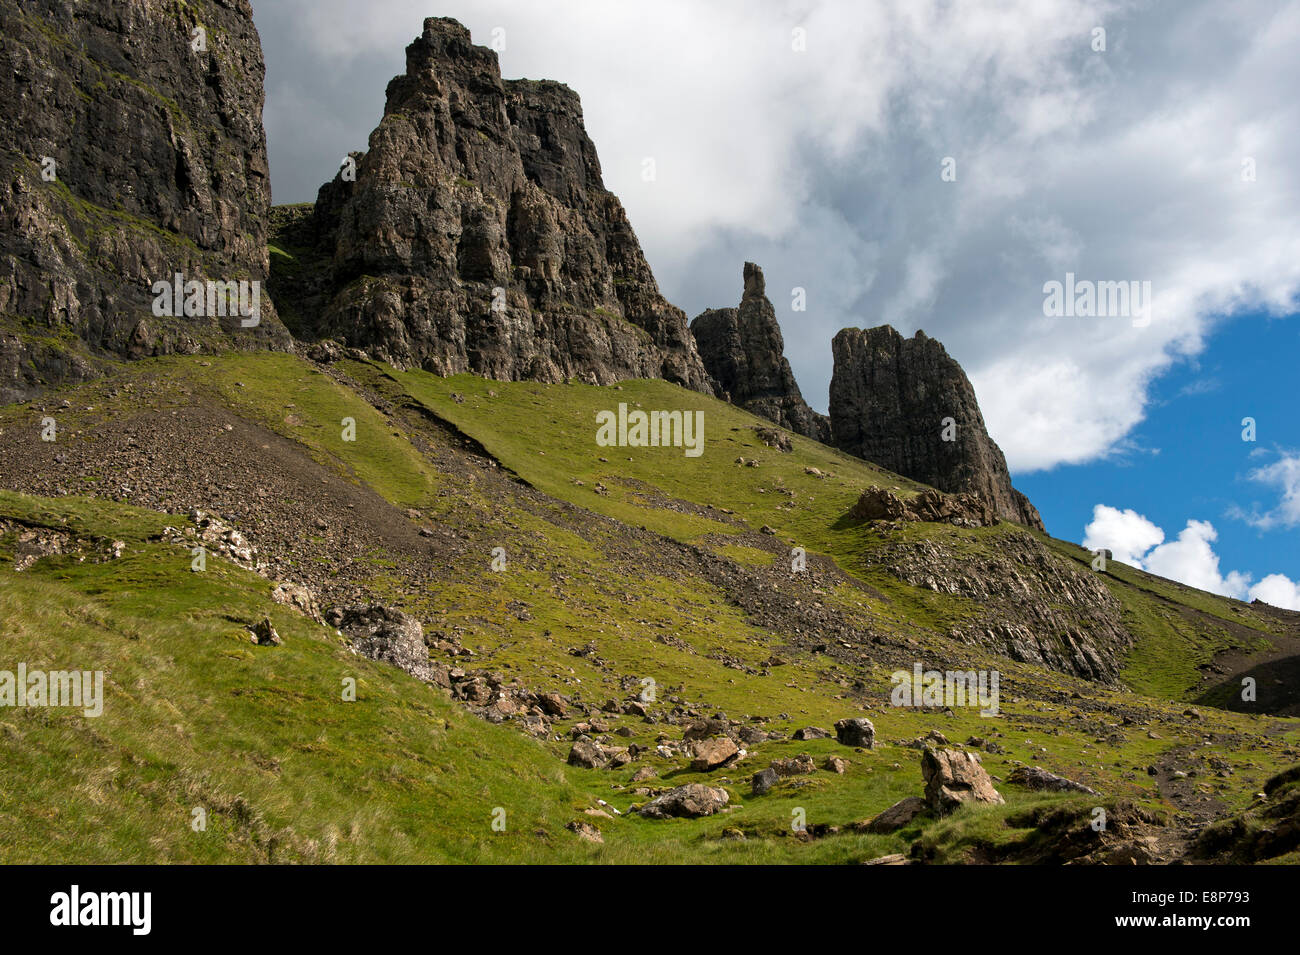 Quiraing mountain landscape of the Trotternish Ridge on the Isle of Skye. Inner Hebrides, Scotland, United Kingdom - Stock Image